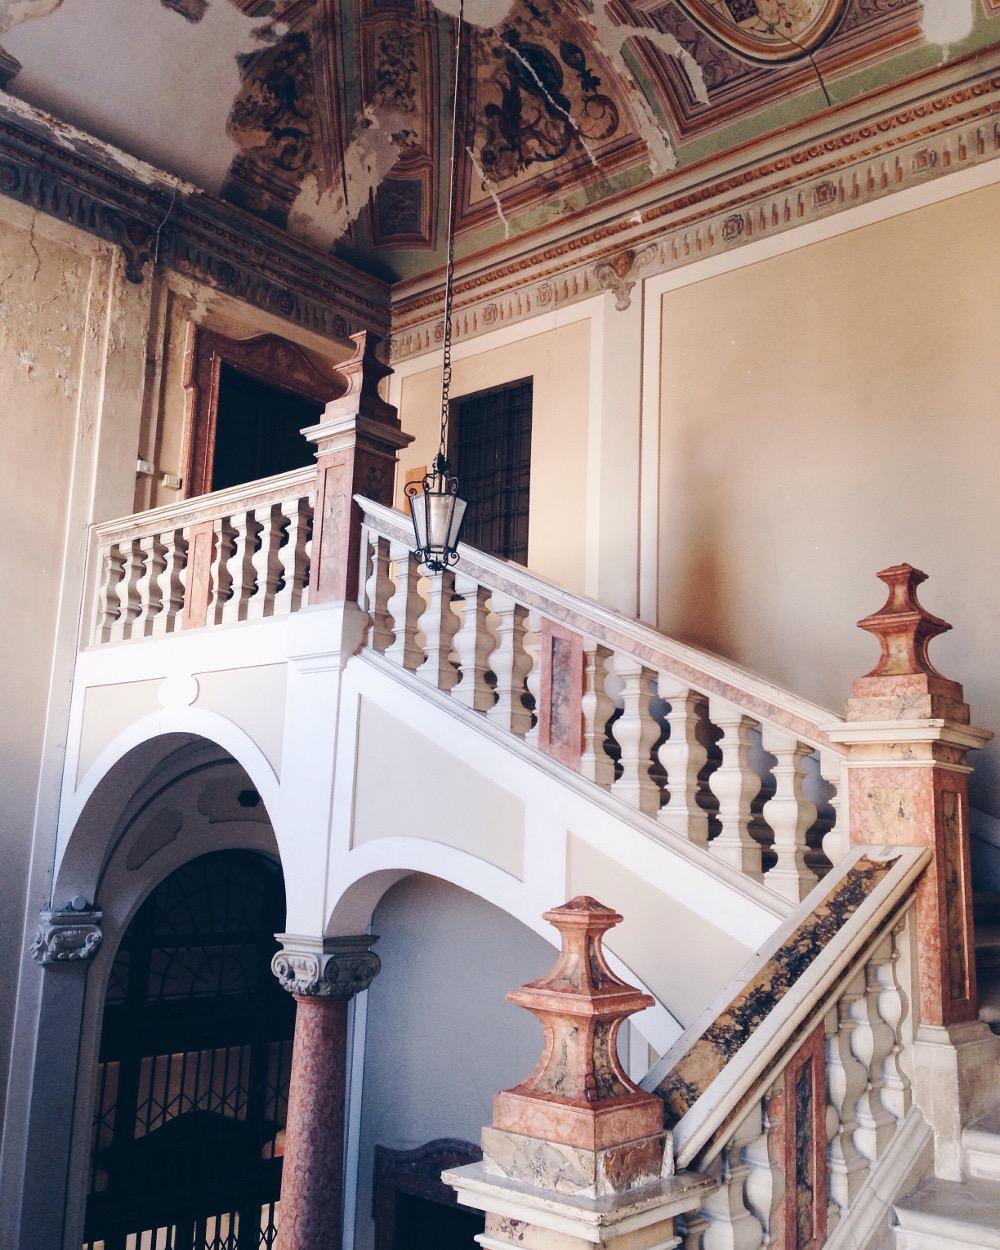 rocaille-palazzo-tosca-museicivici-pesaro